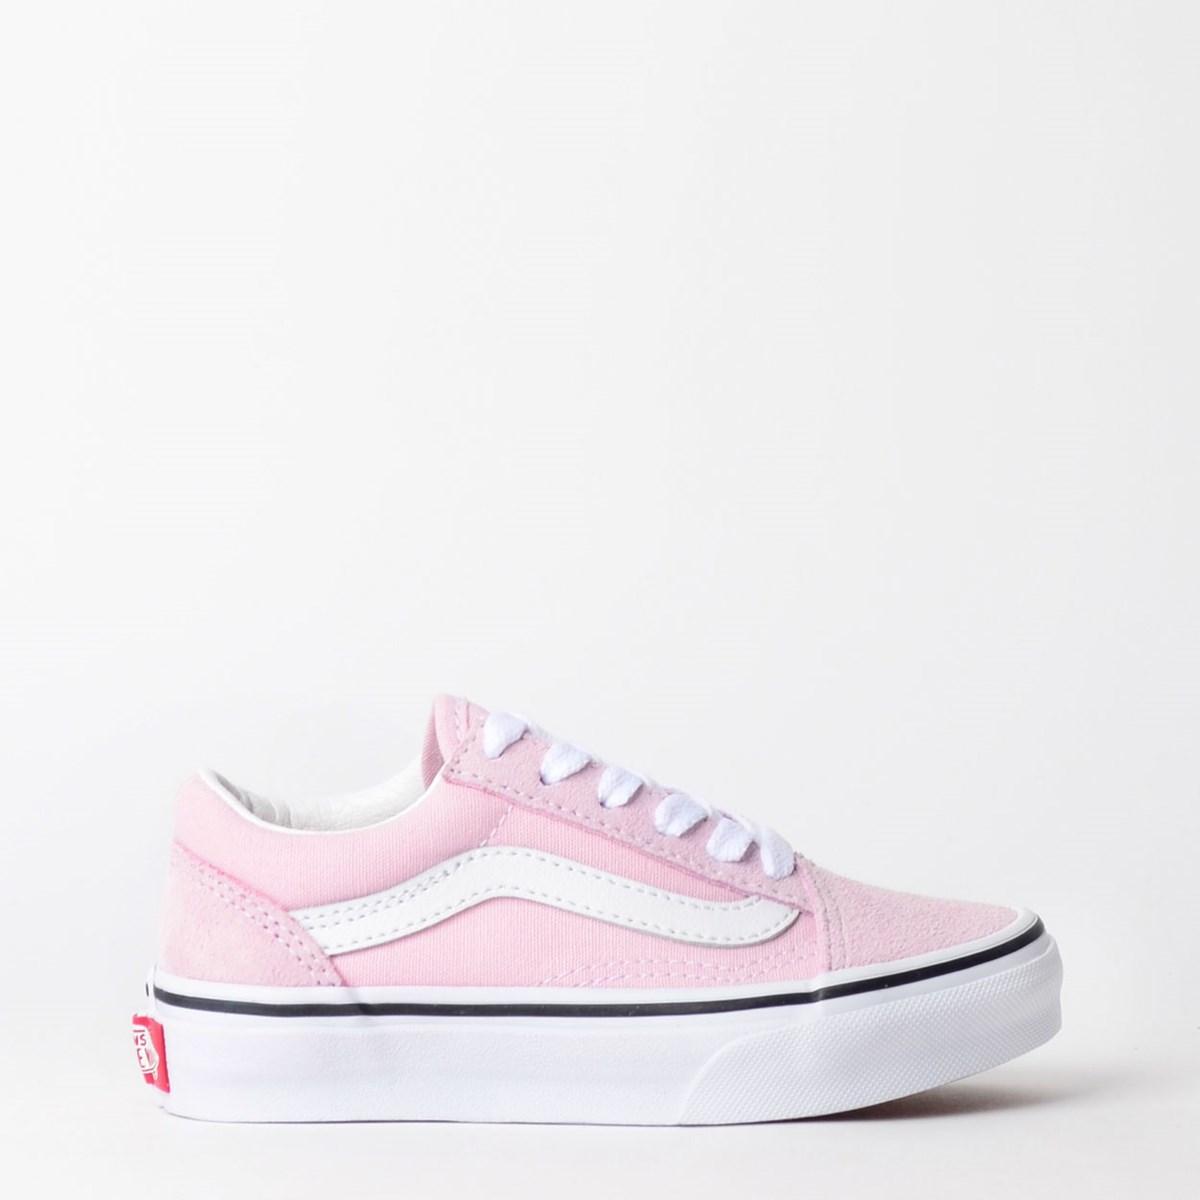 Tênis Vans Kids Old Skool Lilac Snow True White VN0A4BUUV3M